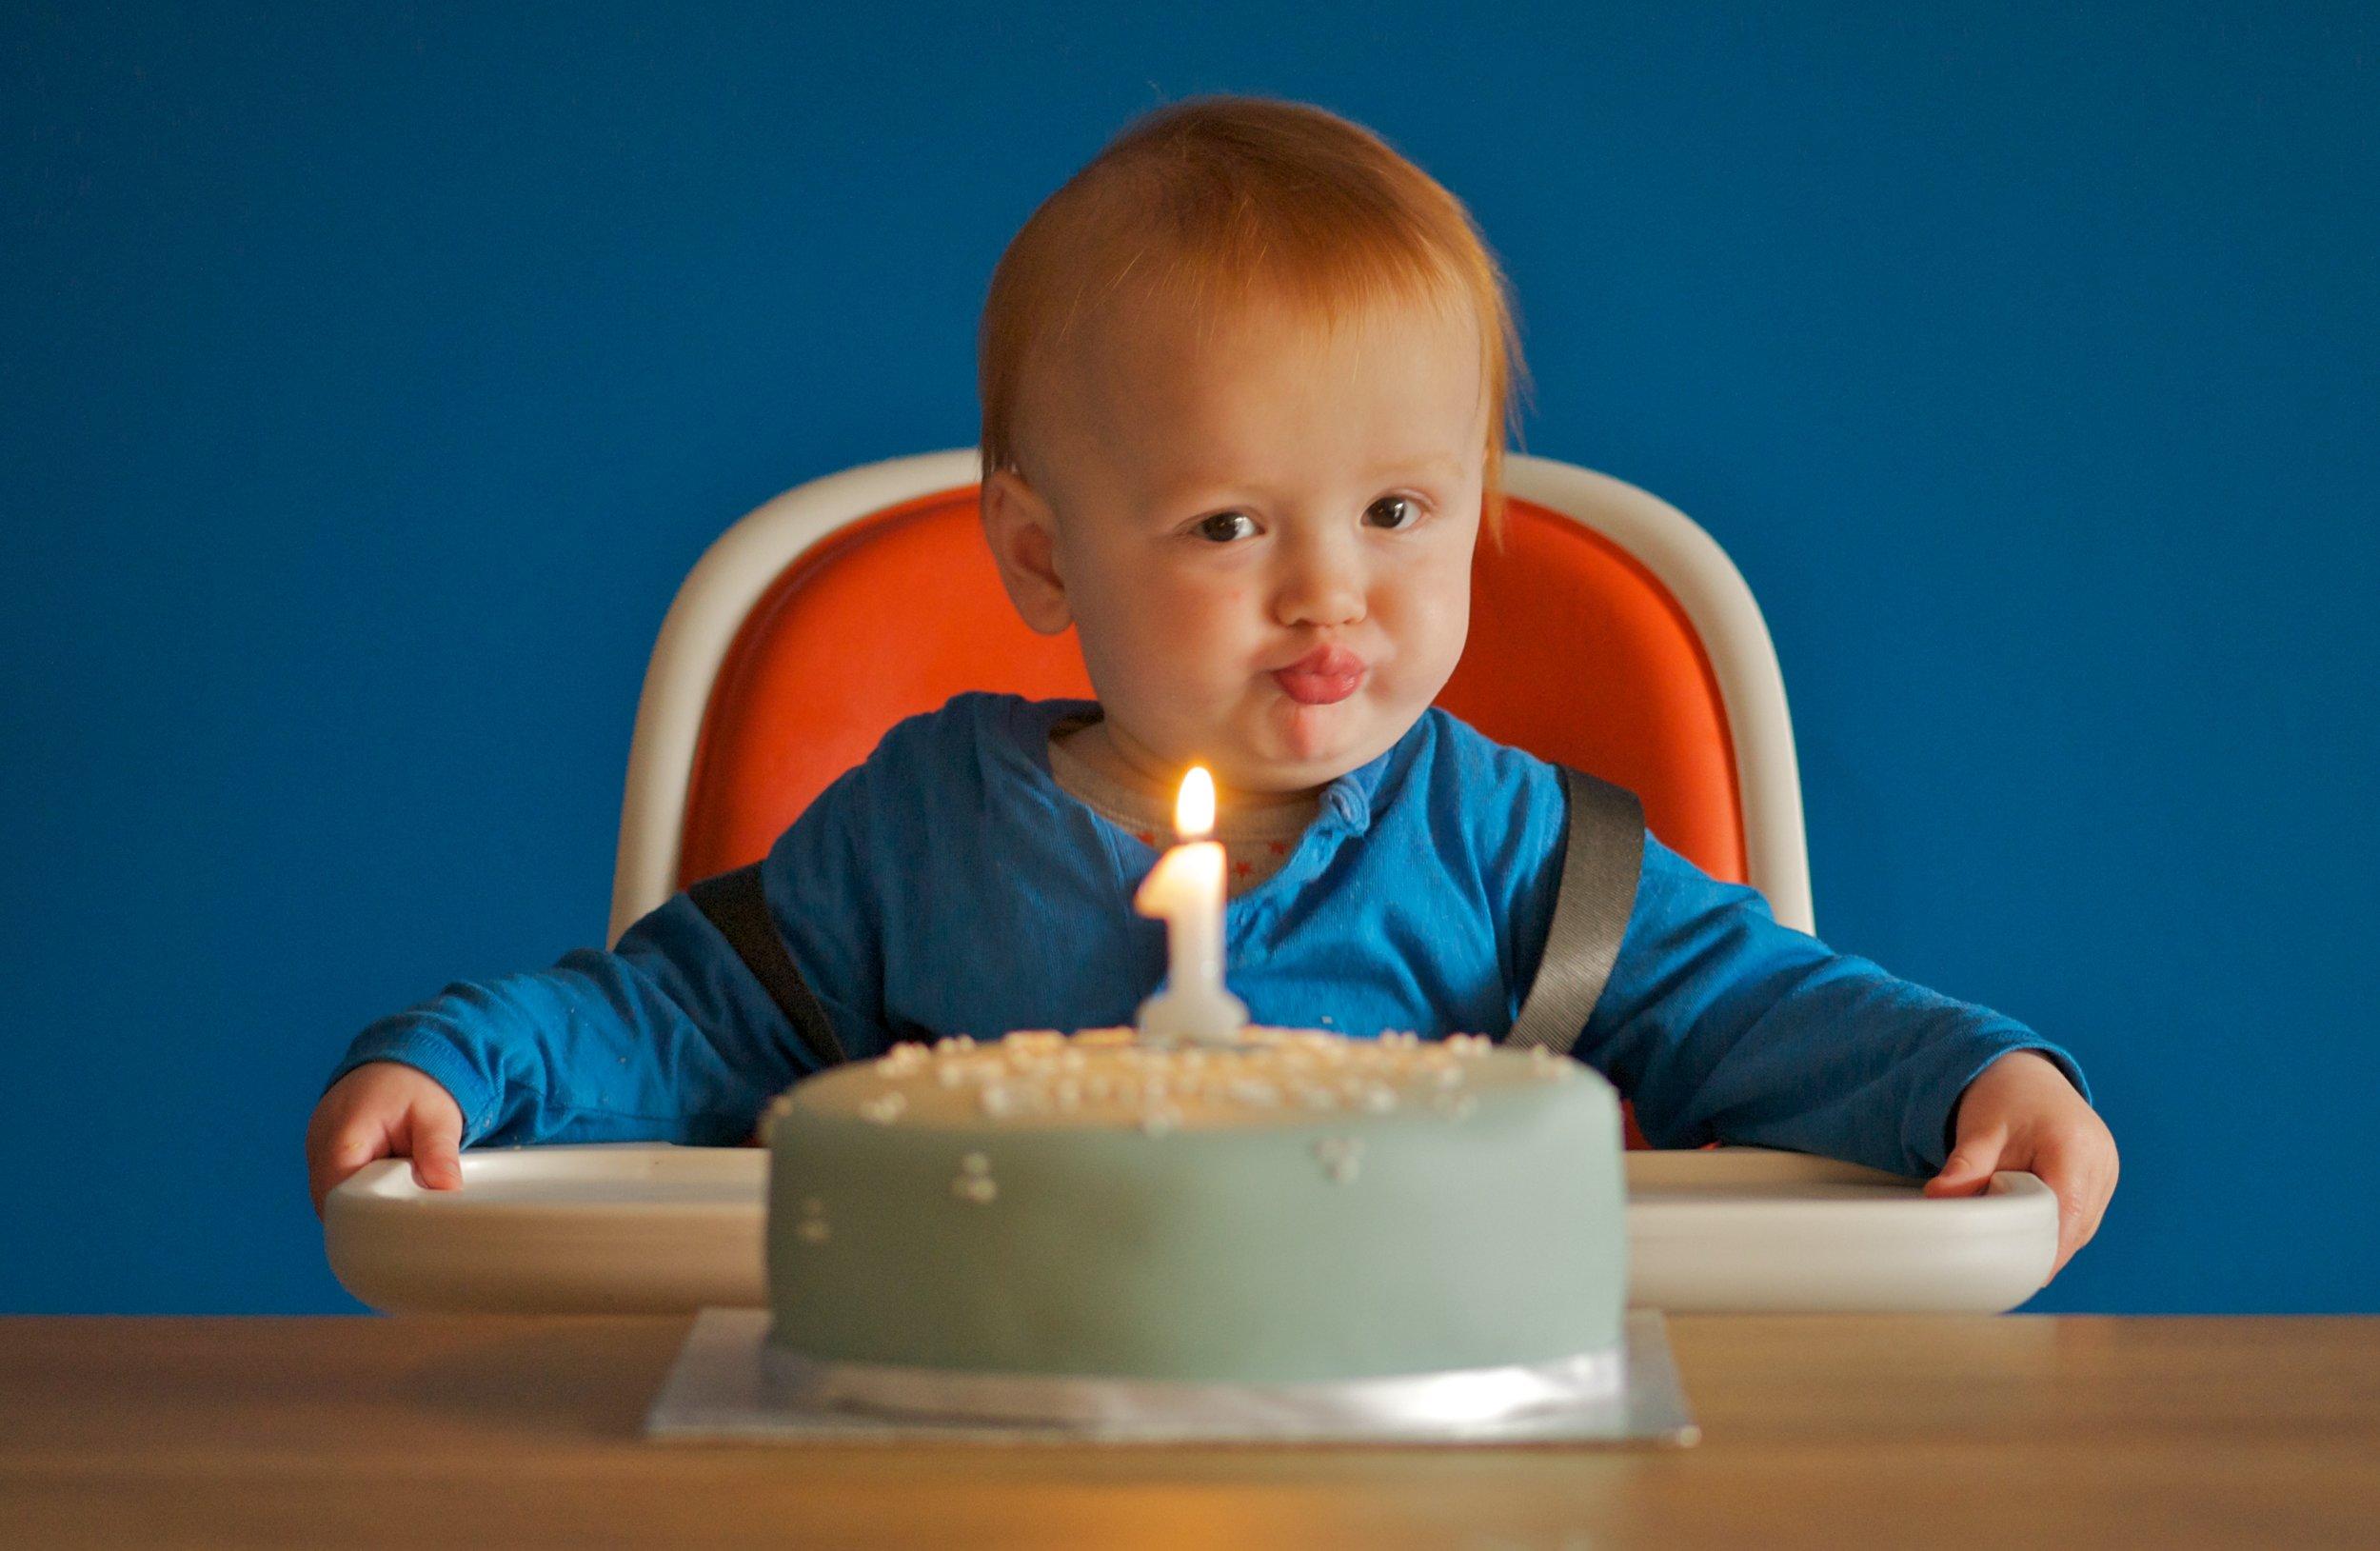 birthday_cake-007_6992945736_o.jpg